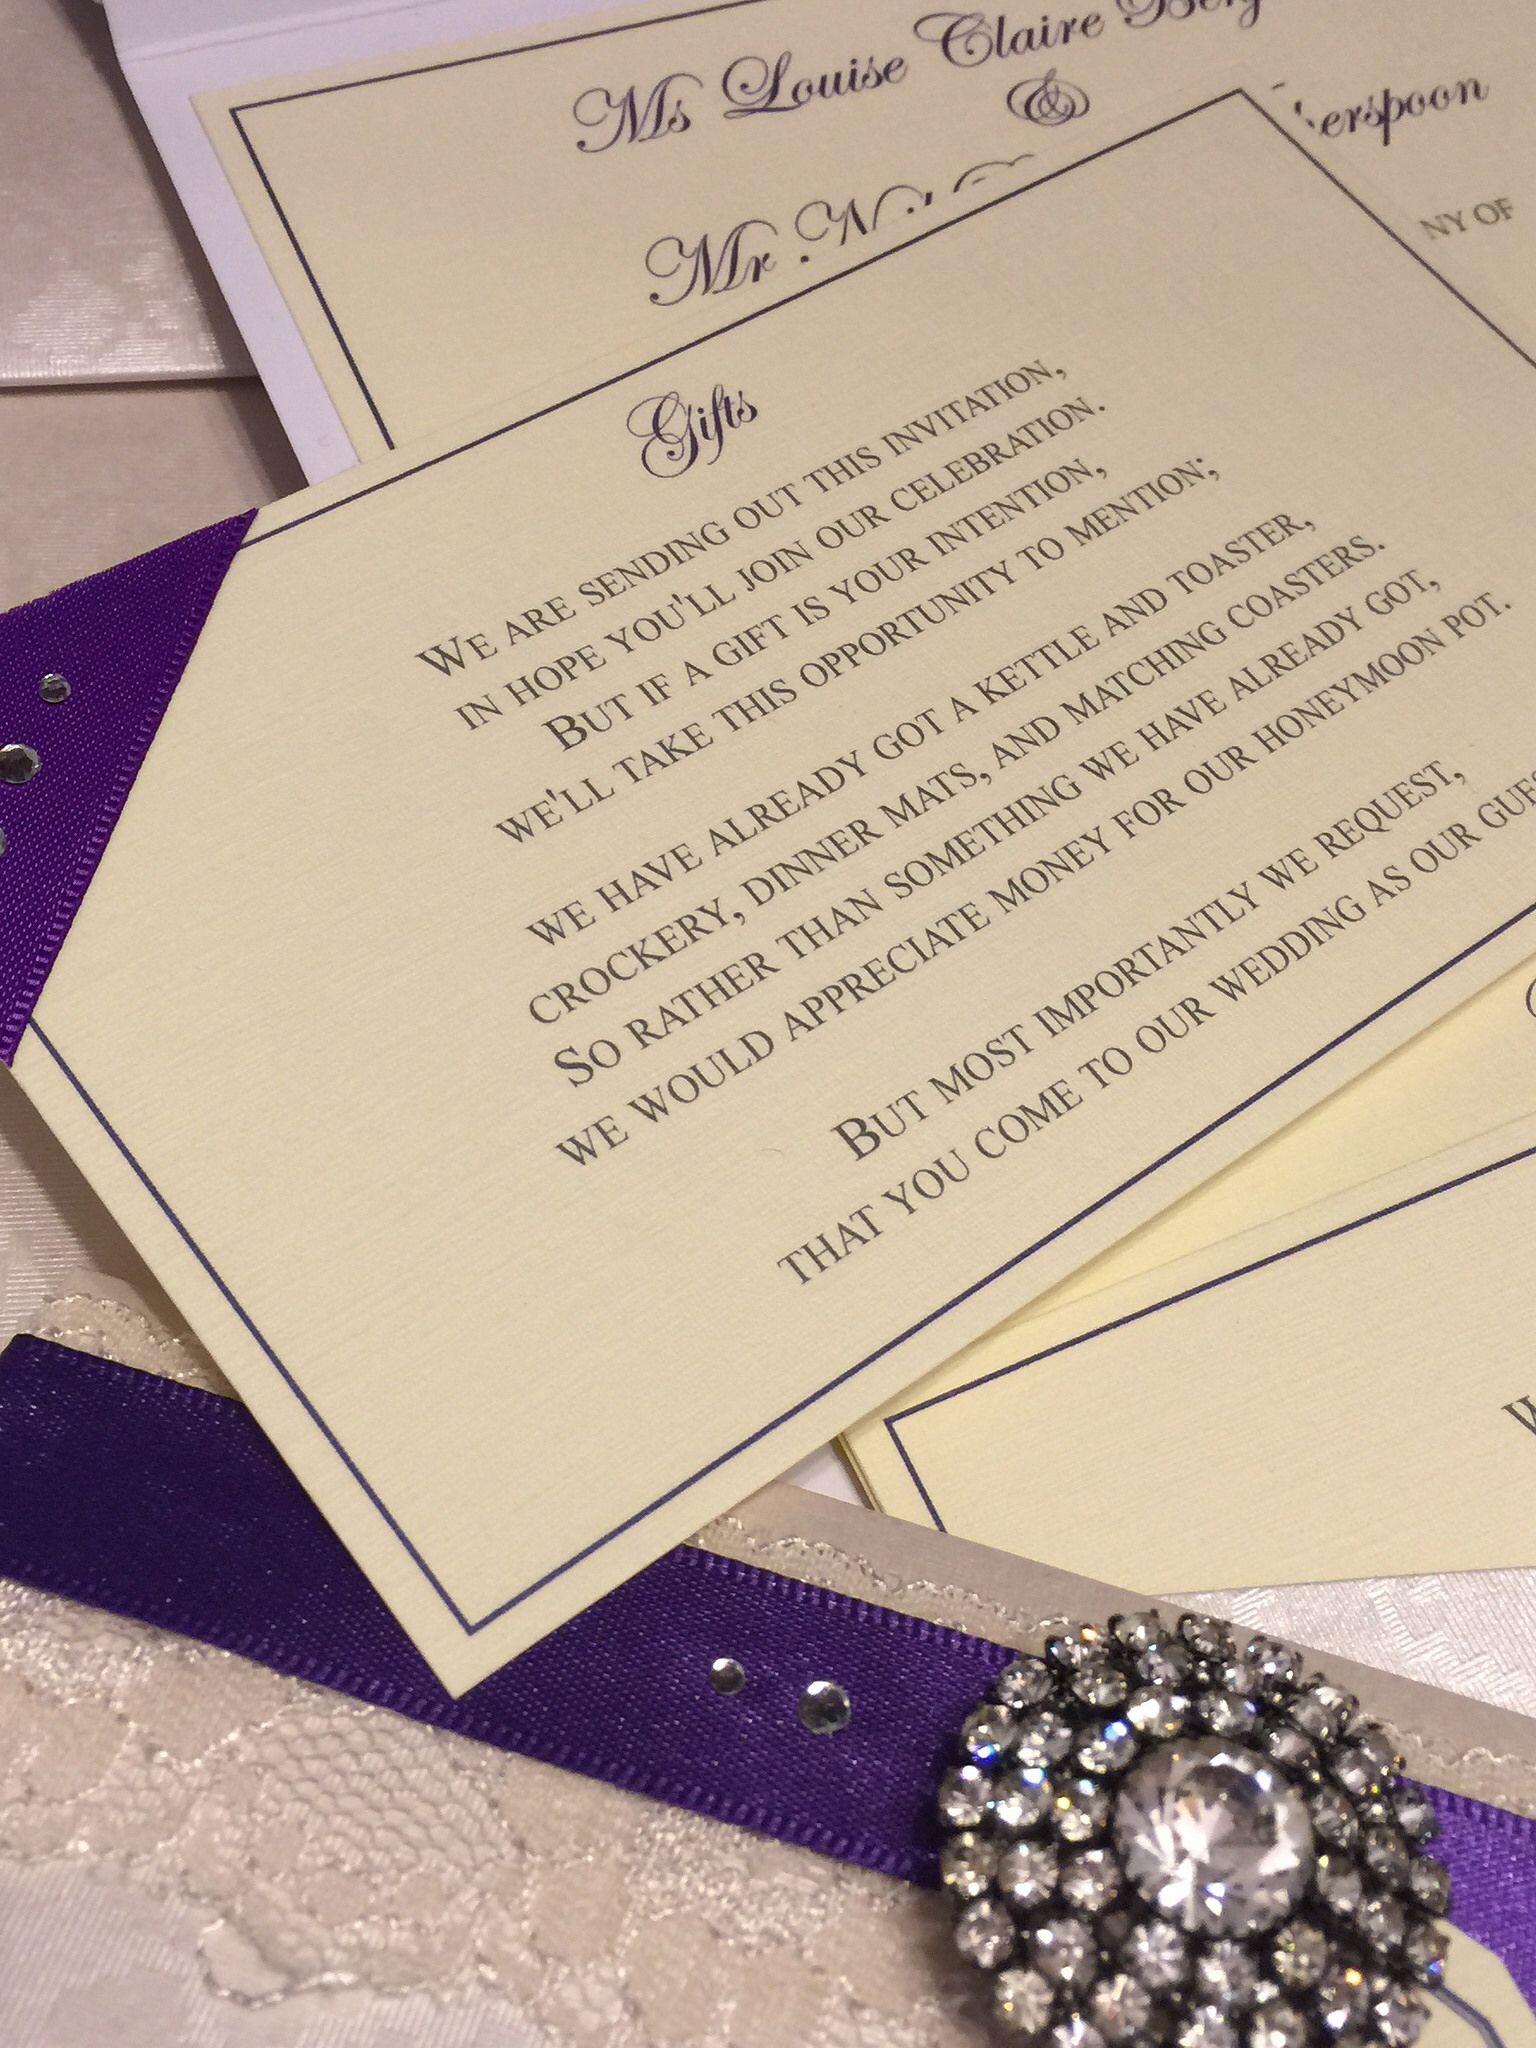 Purple Pocketfold Wedding Invitation With Gift Insert Vintage Inspired Bespoke Handmade Stationery By Perfect